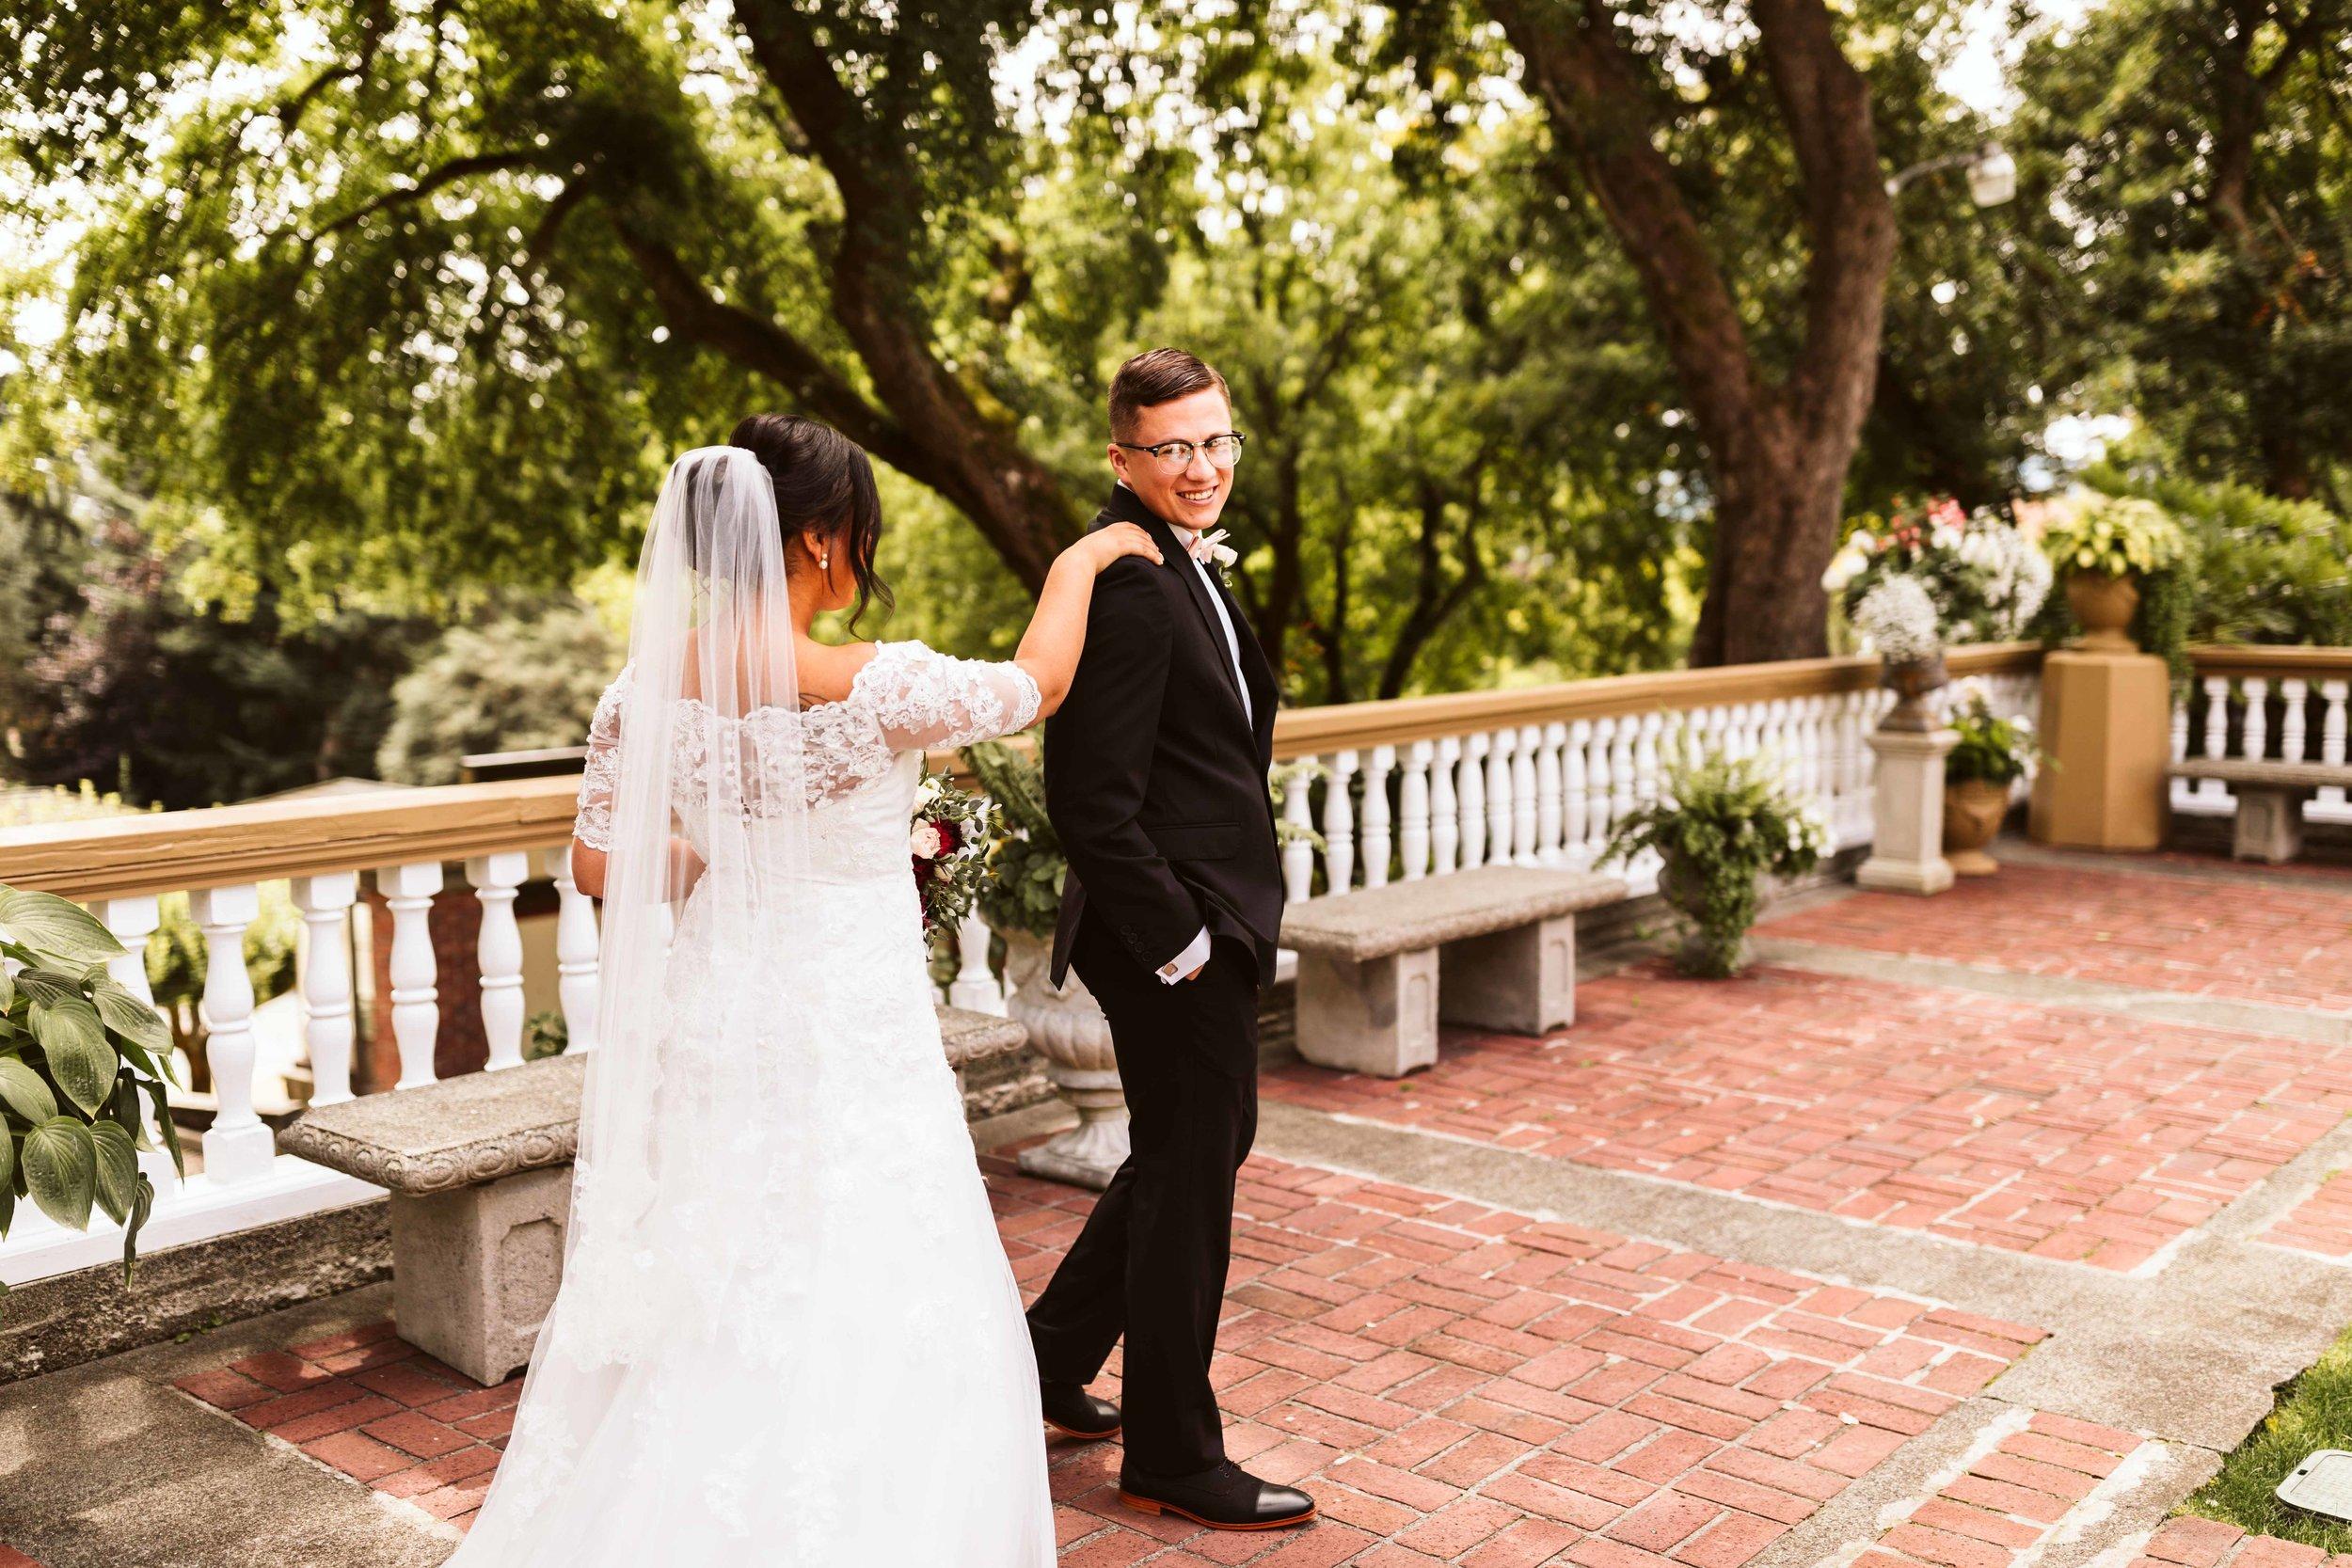 lairmont-manor-wedding-20.jpg